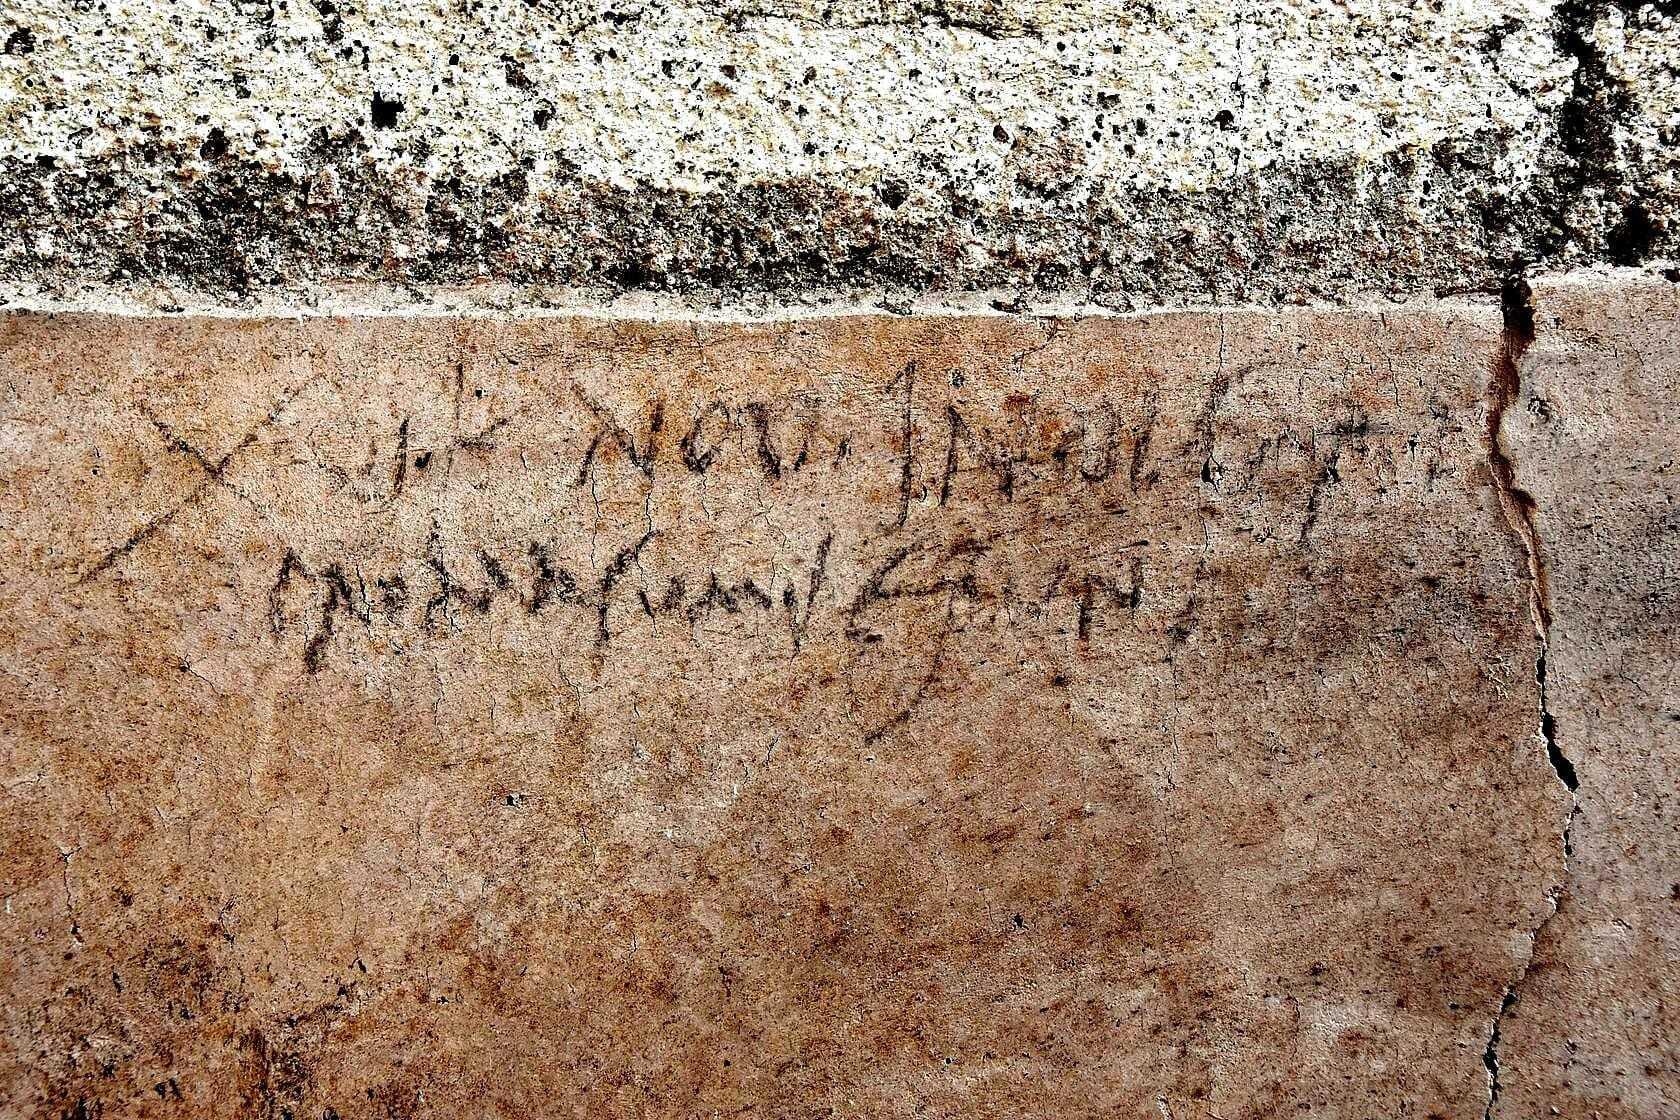 olive-oil-note-rewrites-history-of-vesuvius-eruption